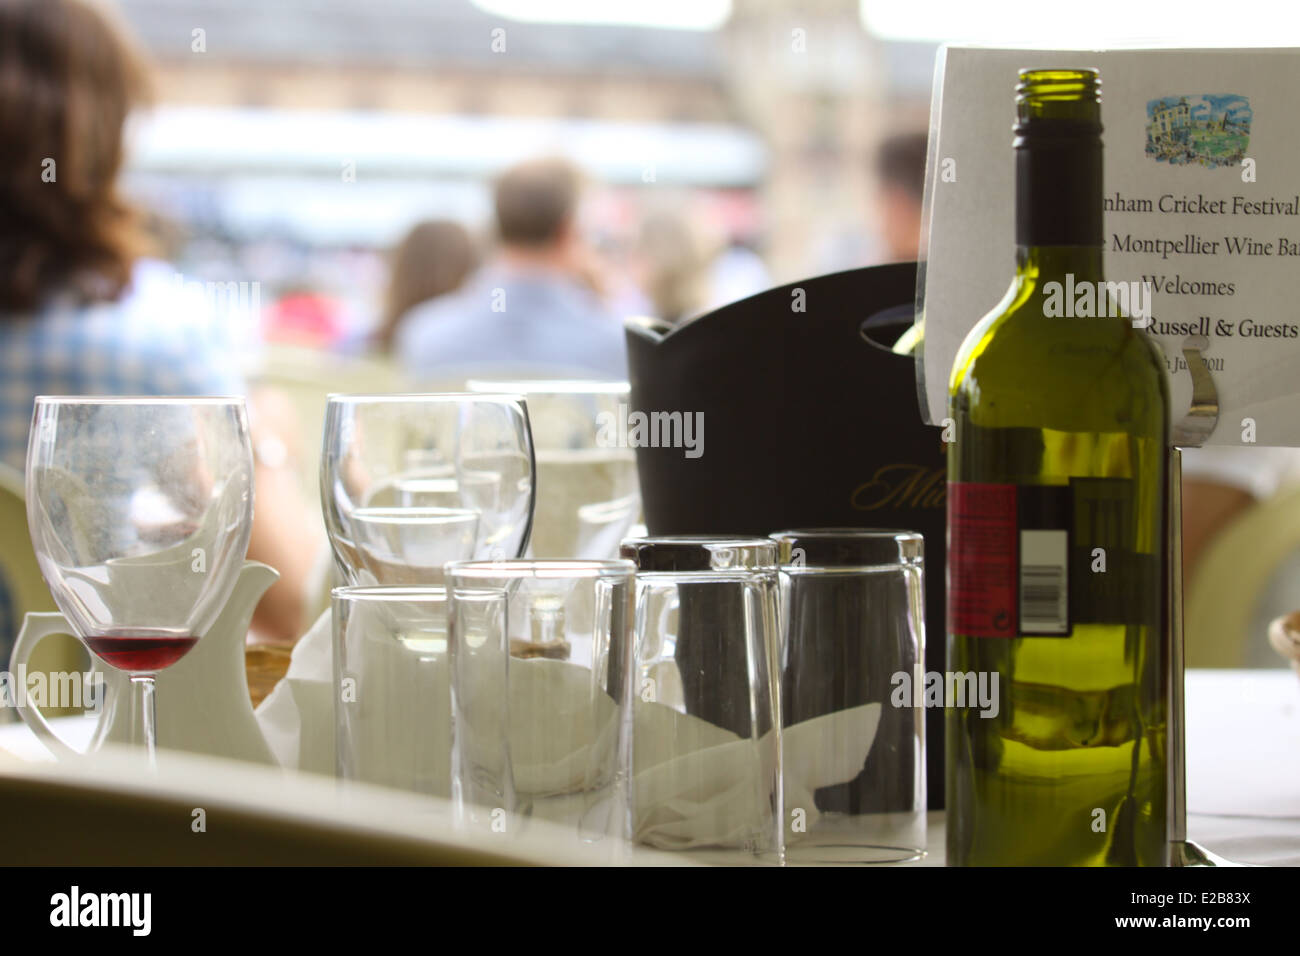 Corporate hospitality at Cheltenham cricket festival - Stock Image